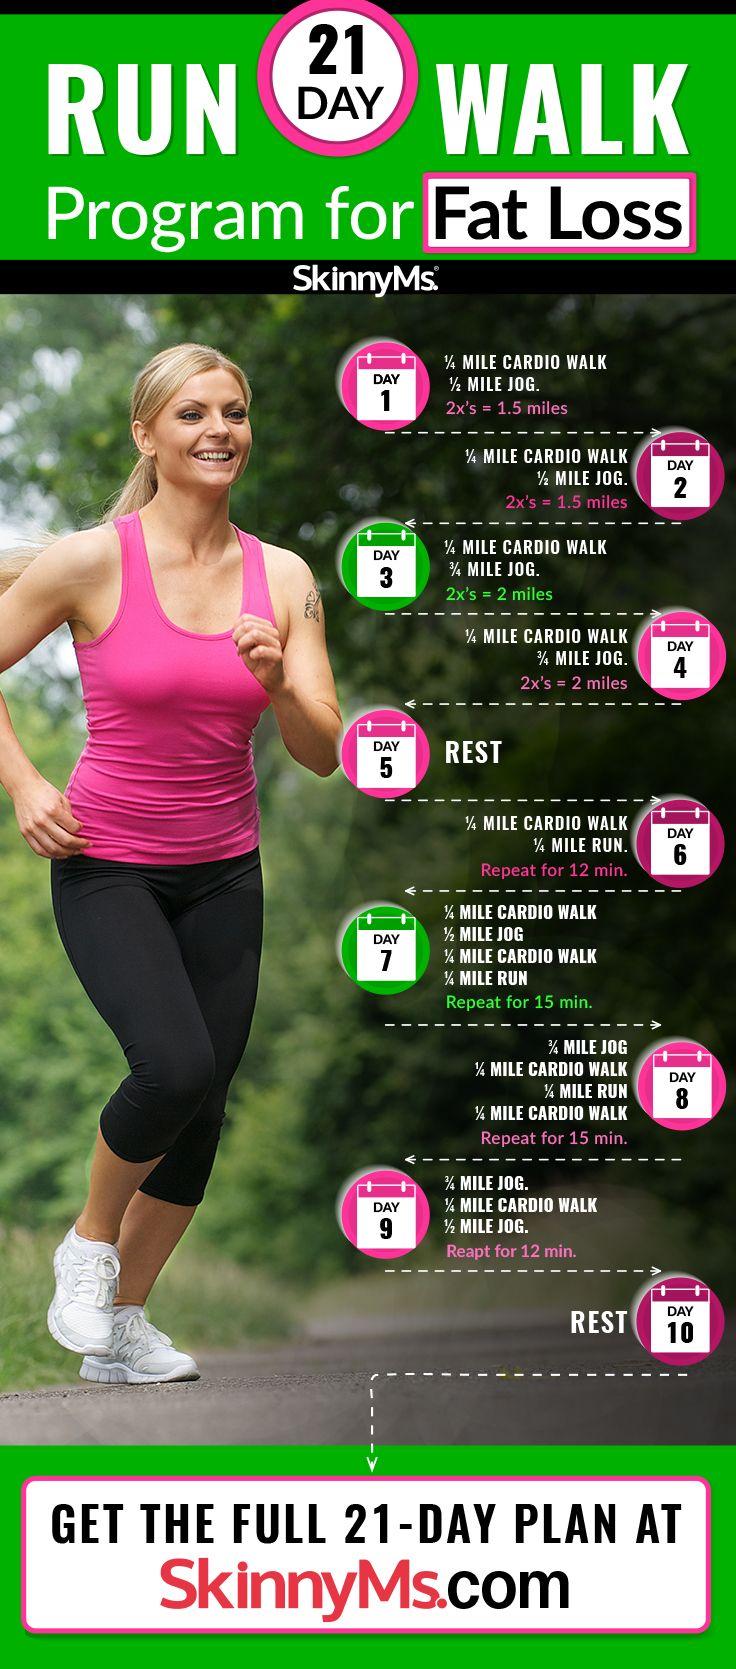 how to get run program